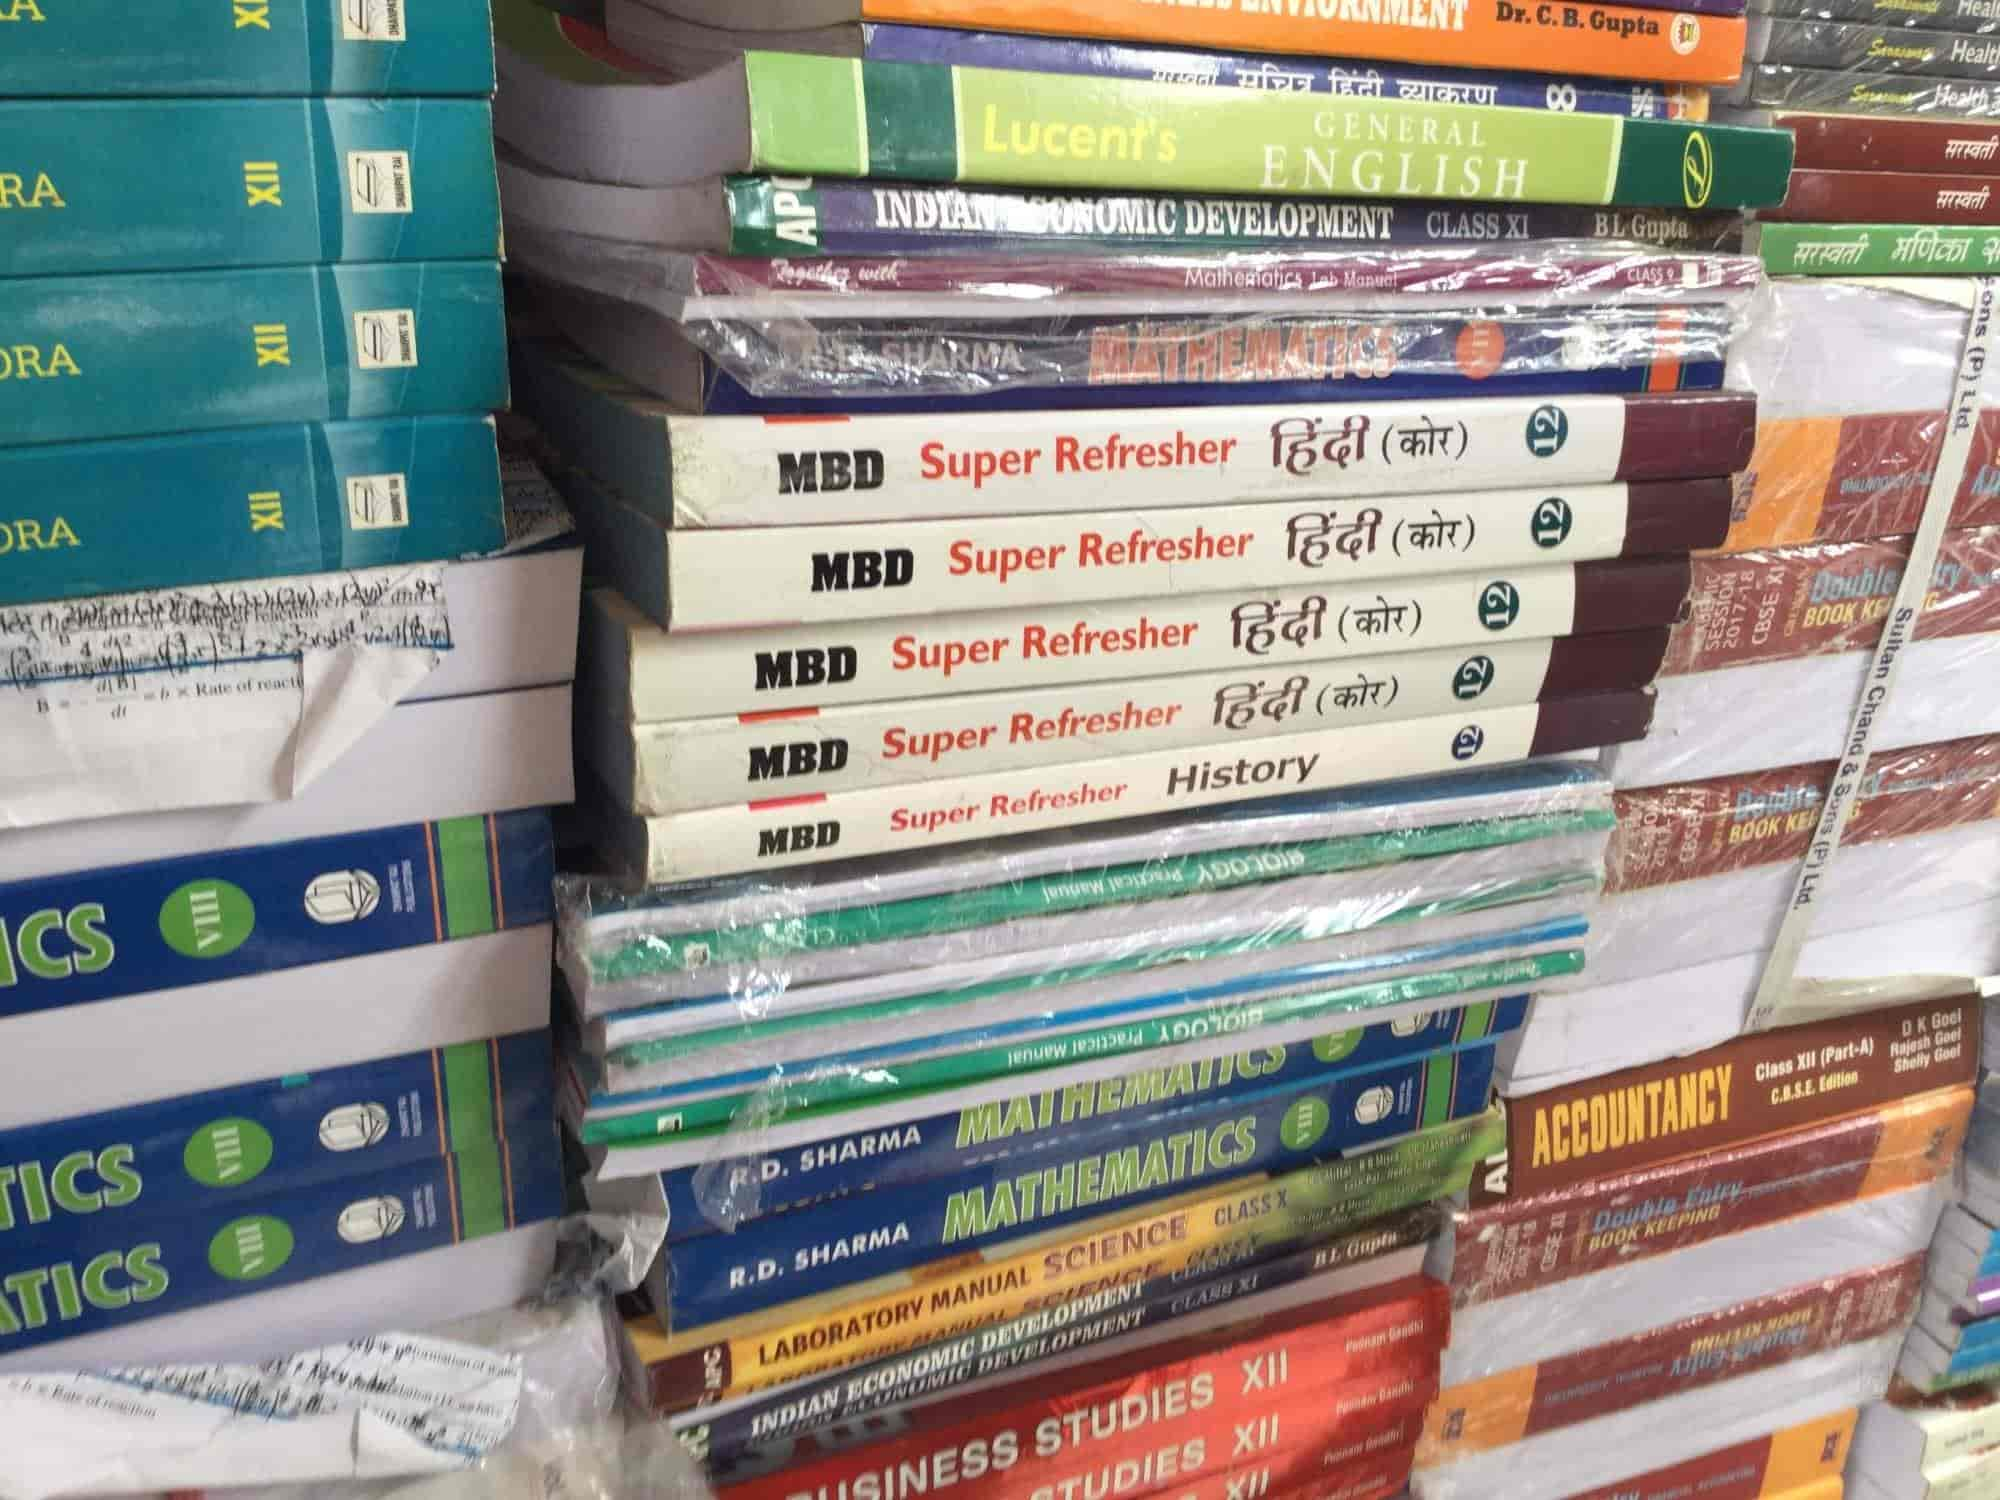 Bhatia Book Depot, Kalkaji - Book Shops in Delhi - Justdial